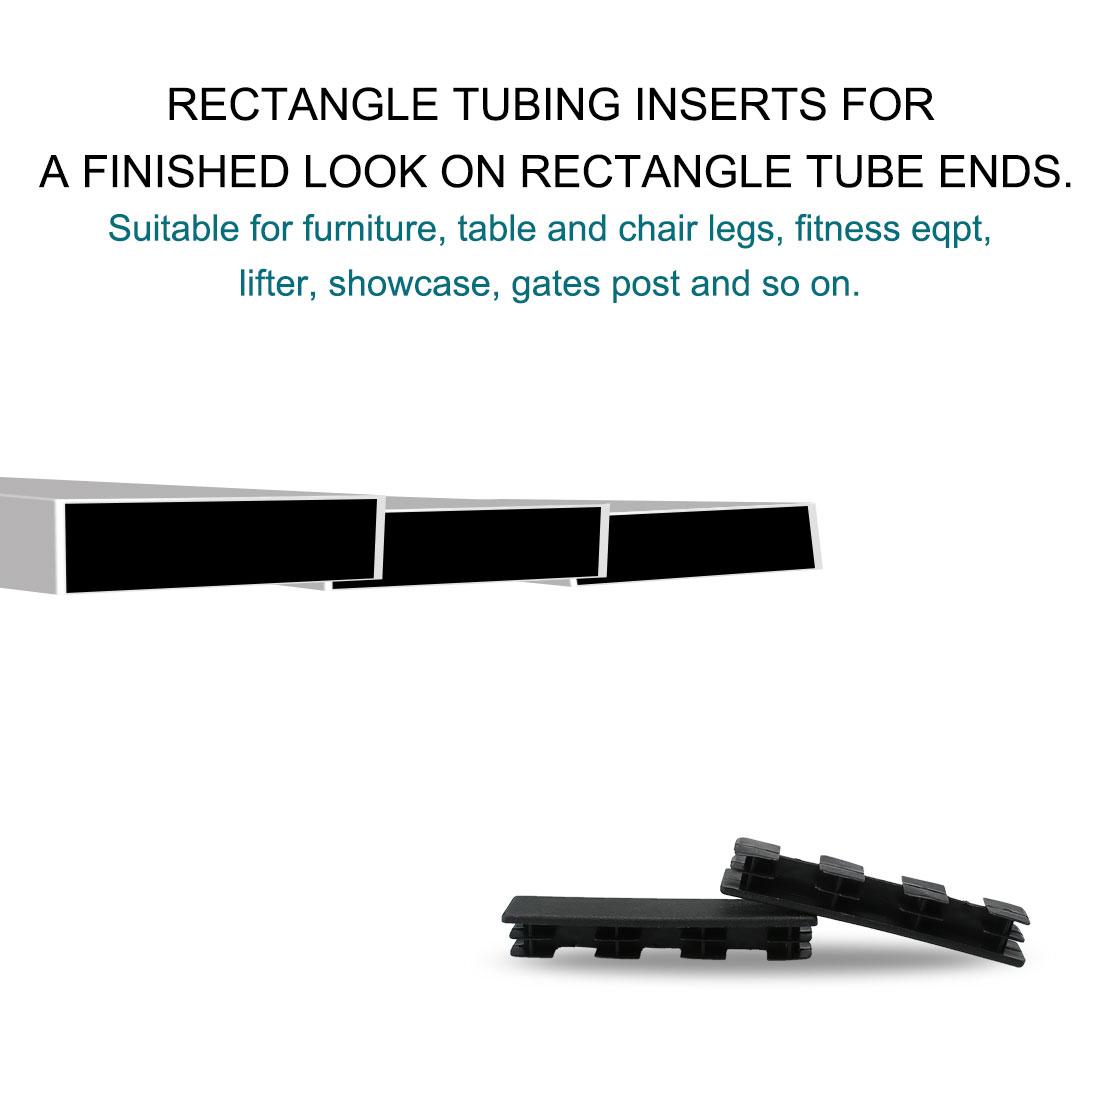 20 x 100mm Plastic Rectangle Ribbed Tube Inserts Furniture Floor Protector 60pcs - image 3 de 7